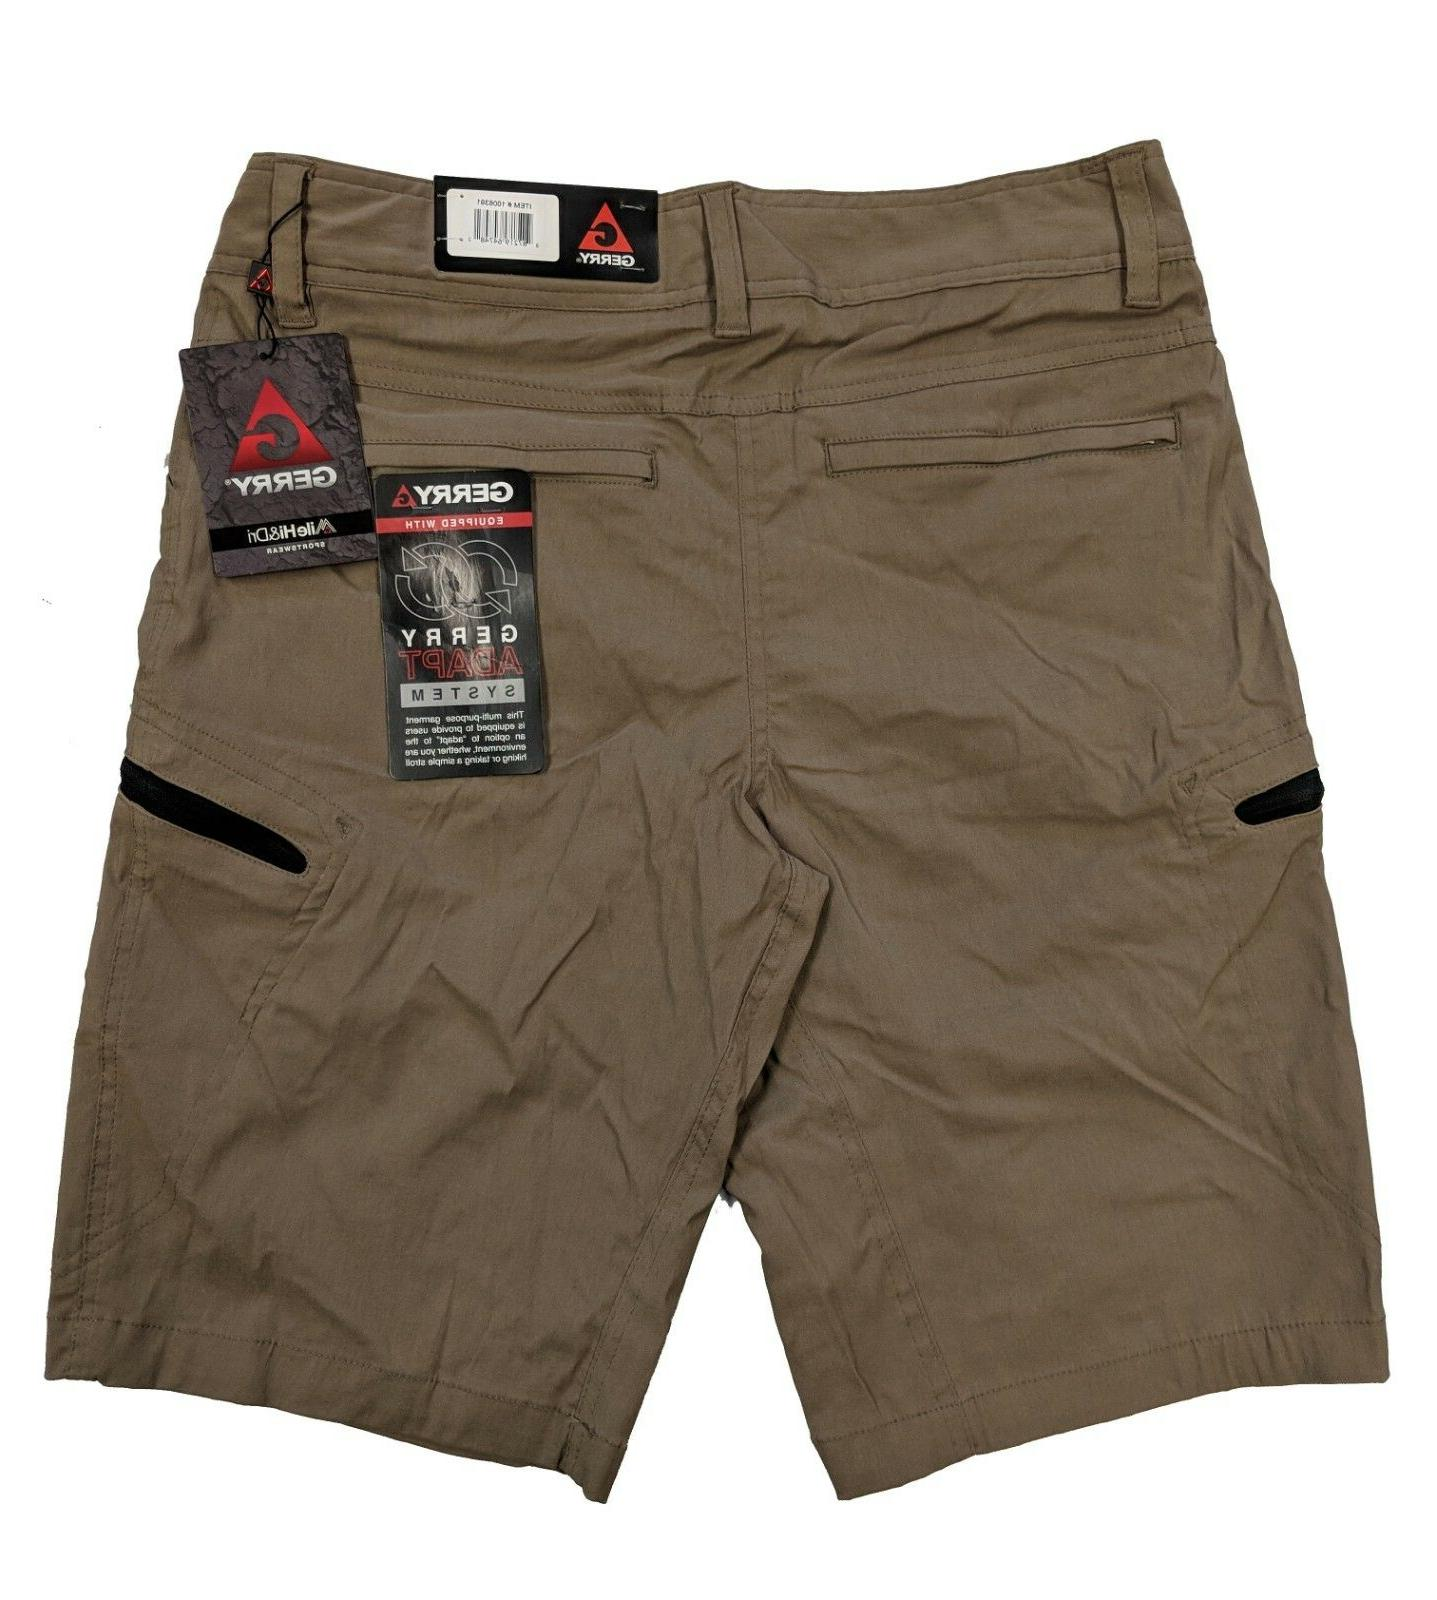 Gerry Mile Hi & Sportswear Protection Tan